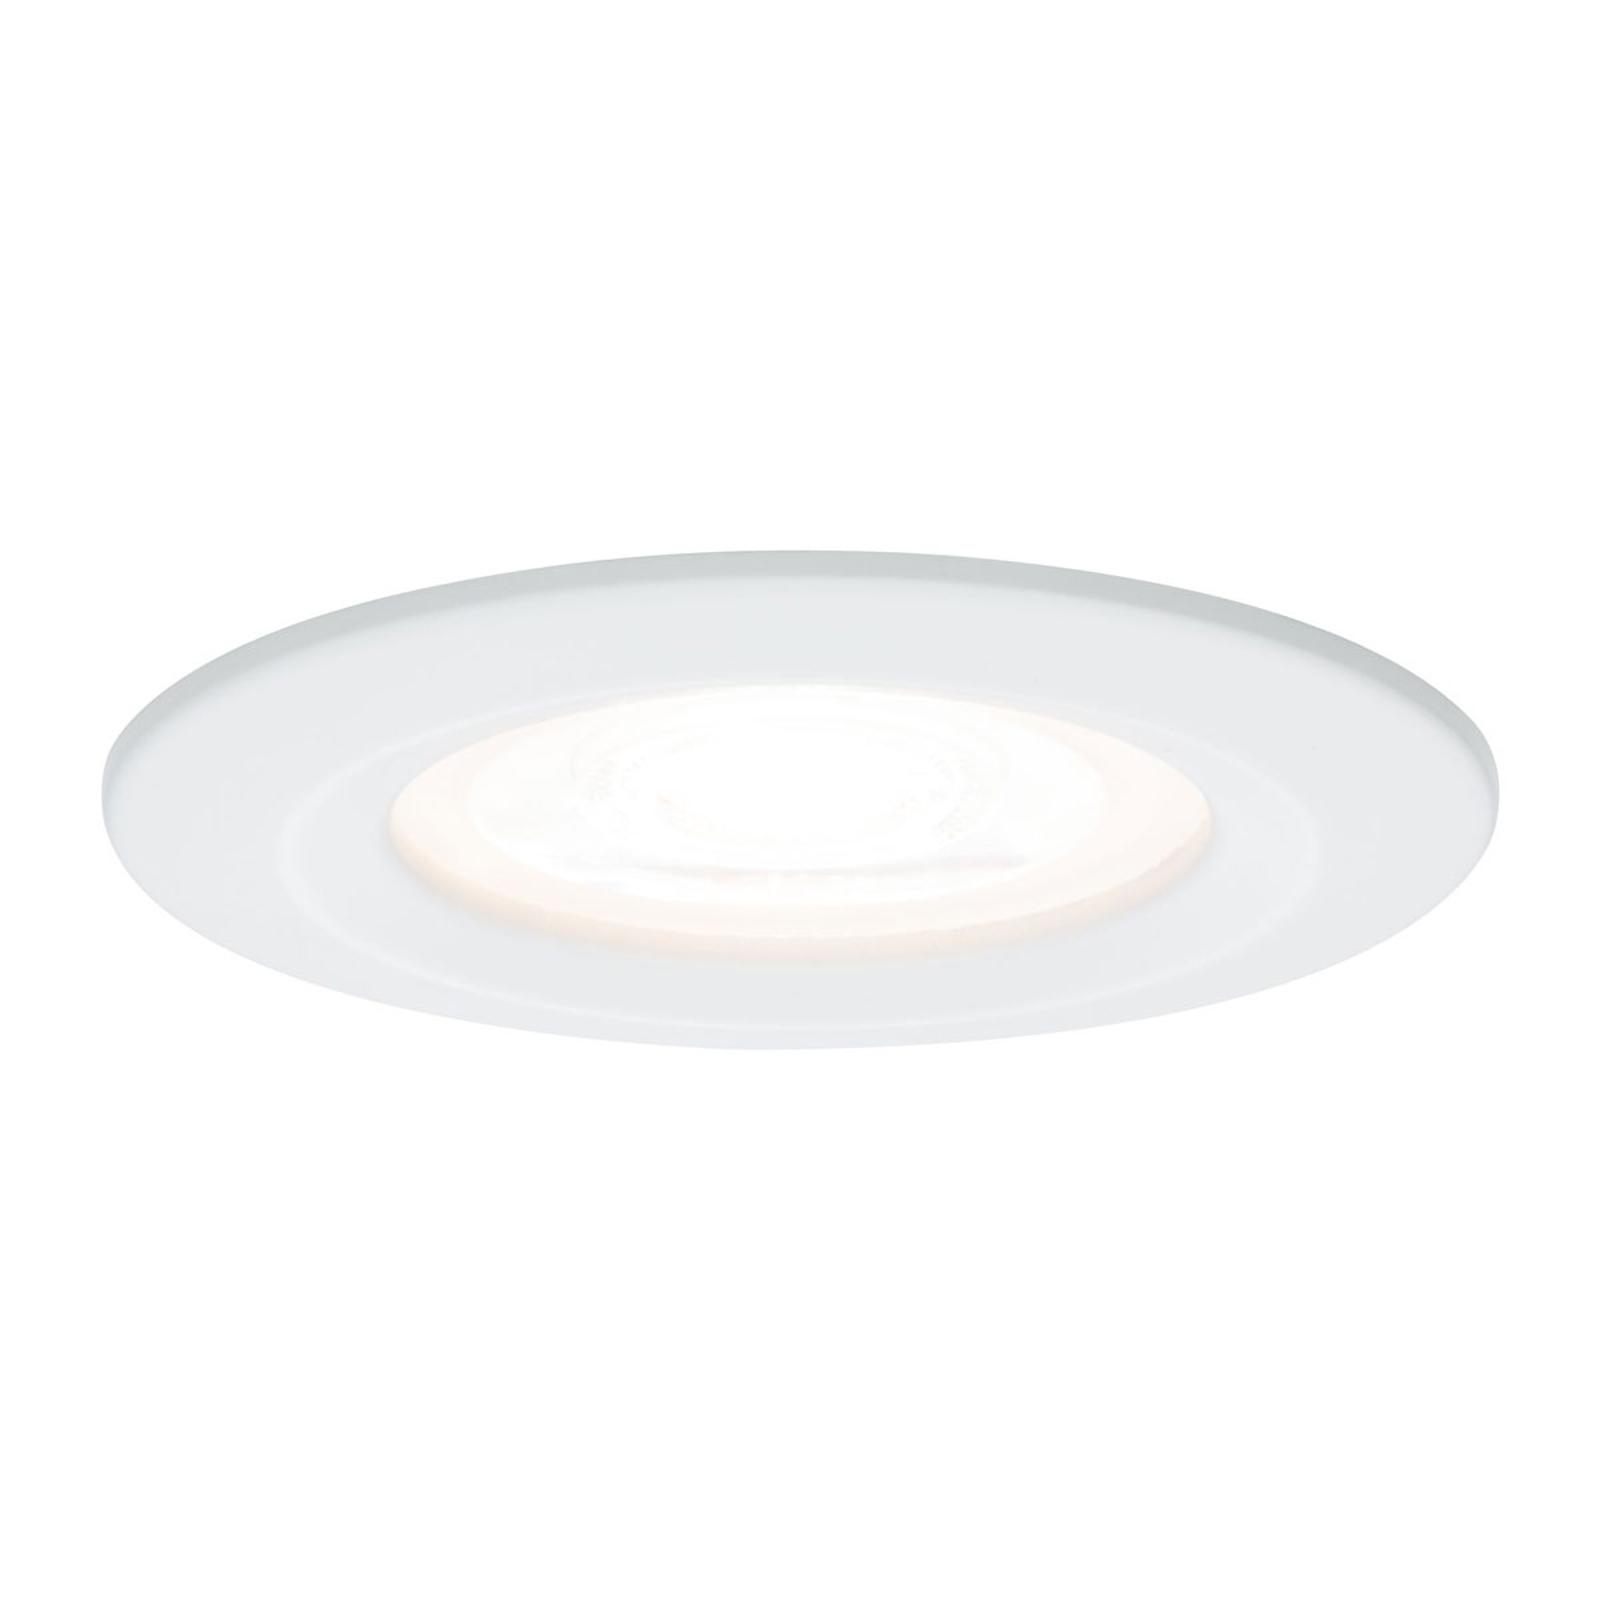 Paulmann LED-Spot Nova rund, IP44, dimmbar, weiß